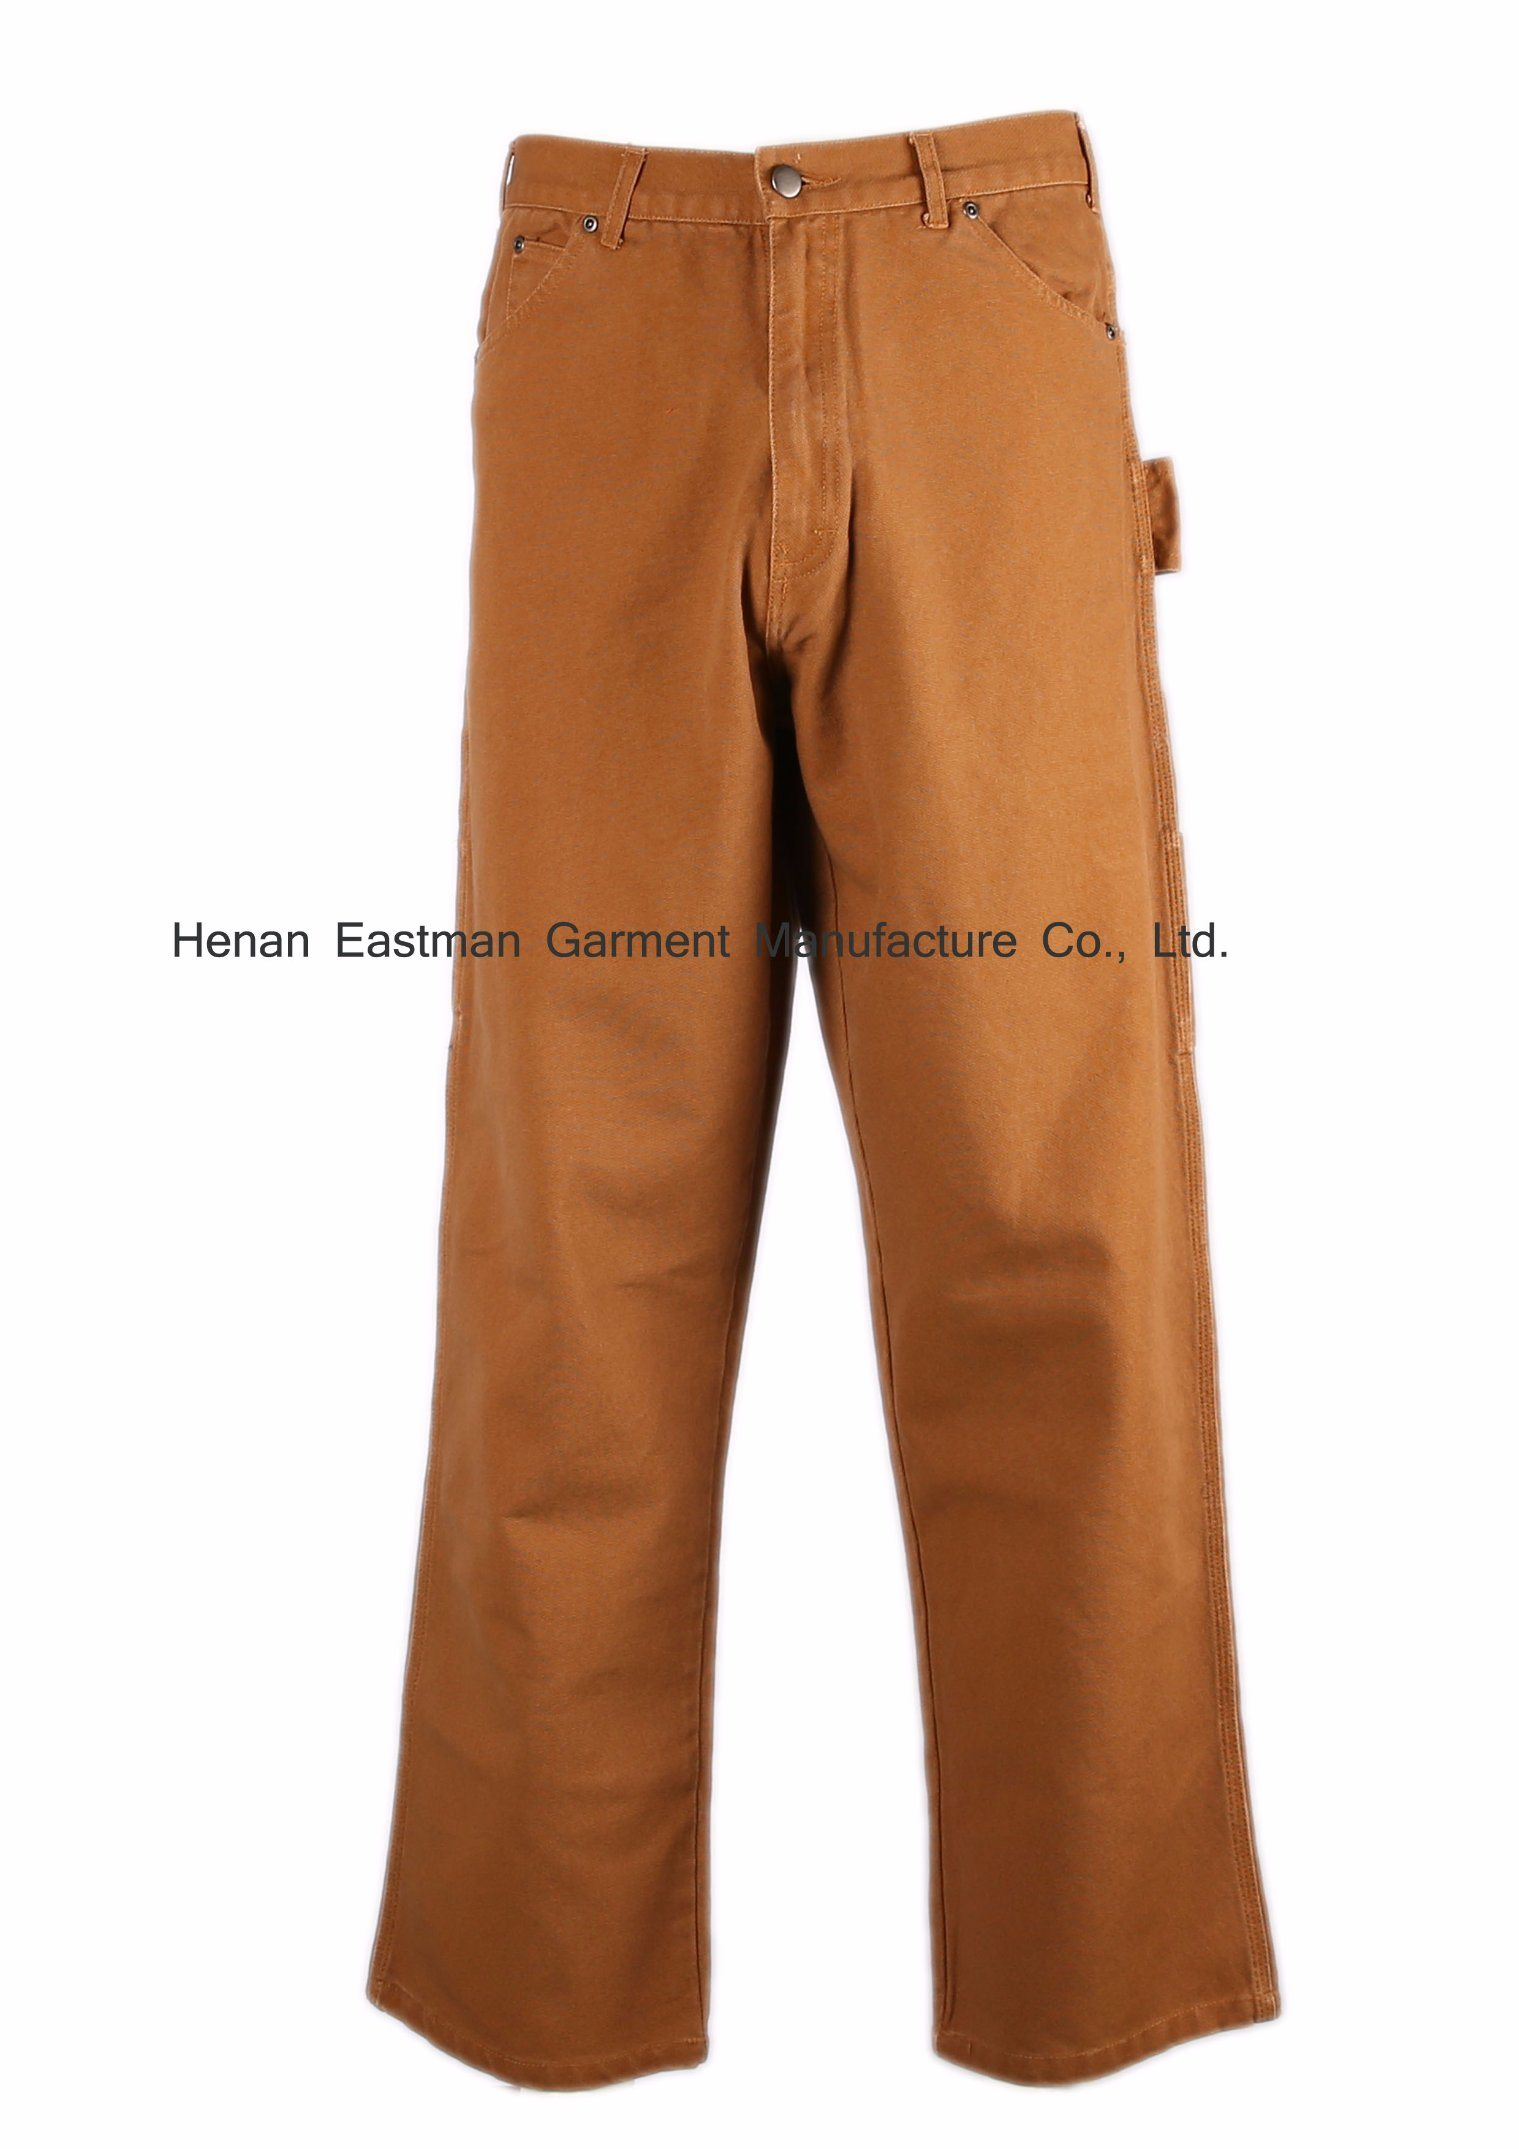 Wholesale Industrial Canvas Cargo Pants